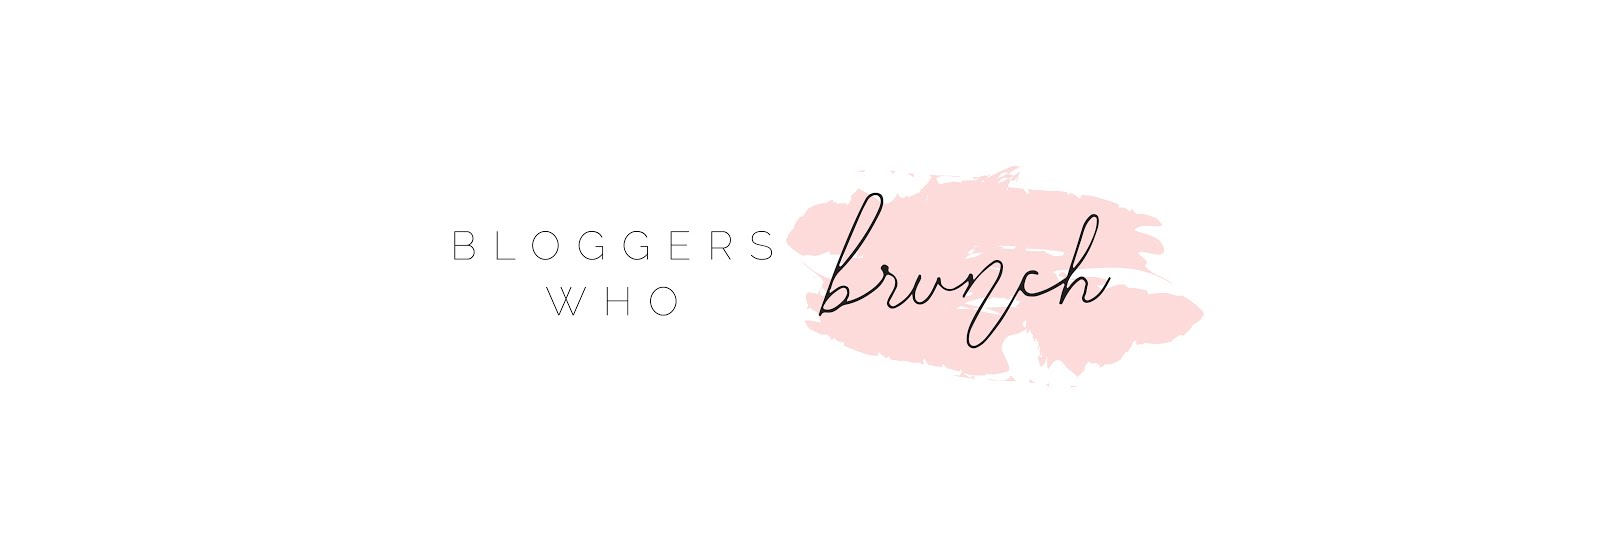 bloggerswhobrunch